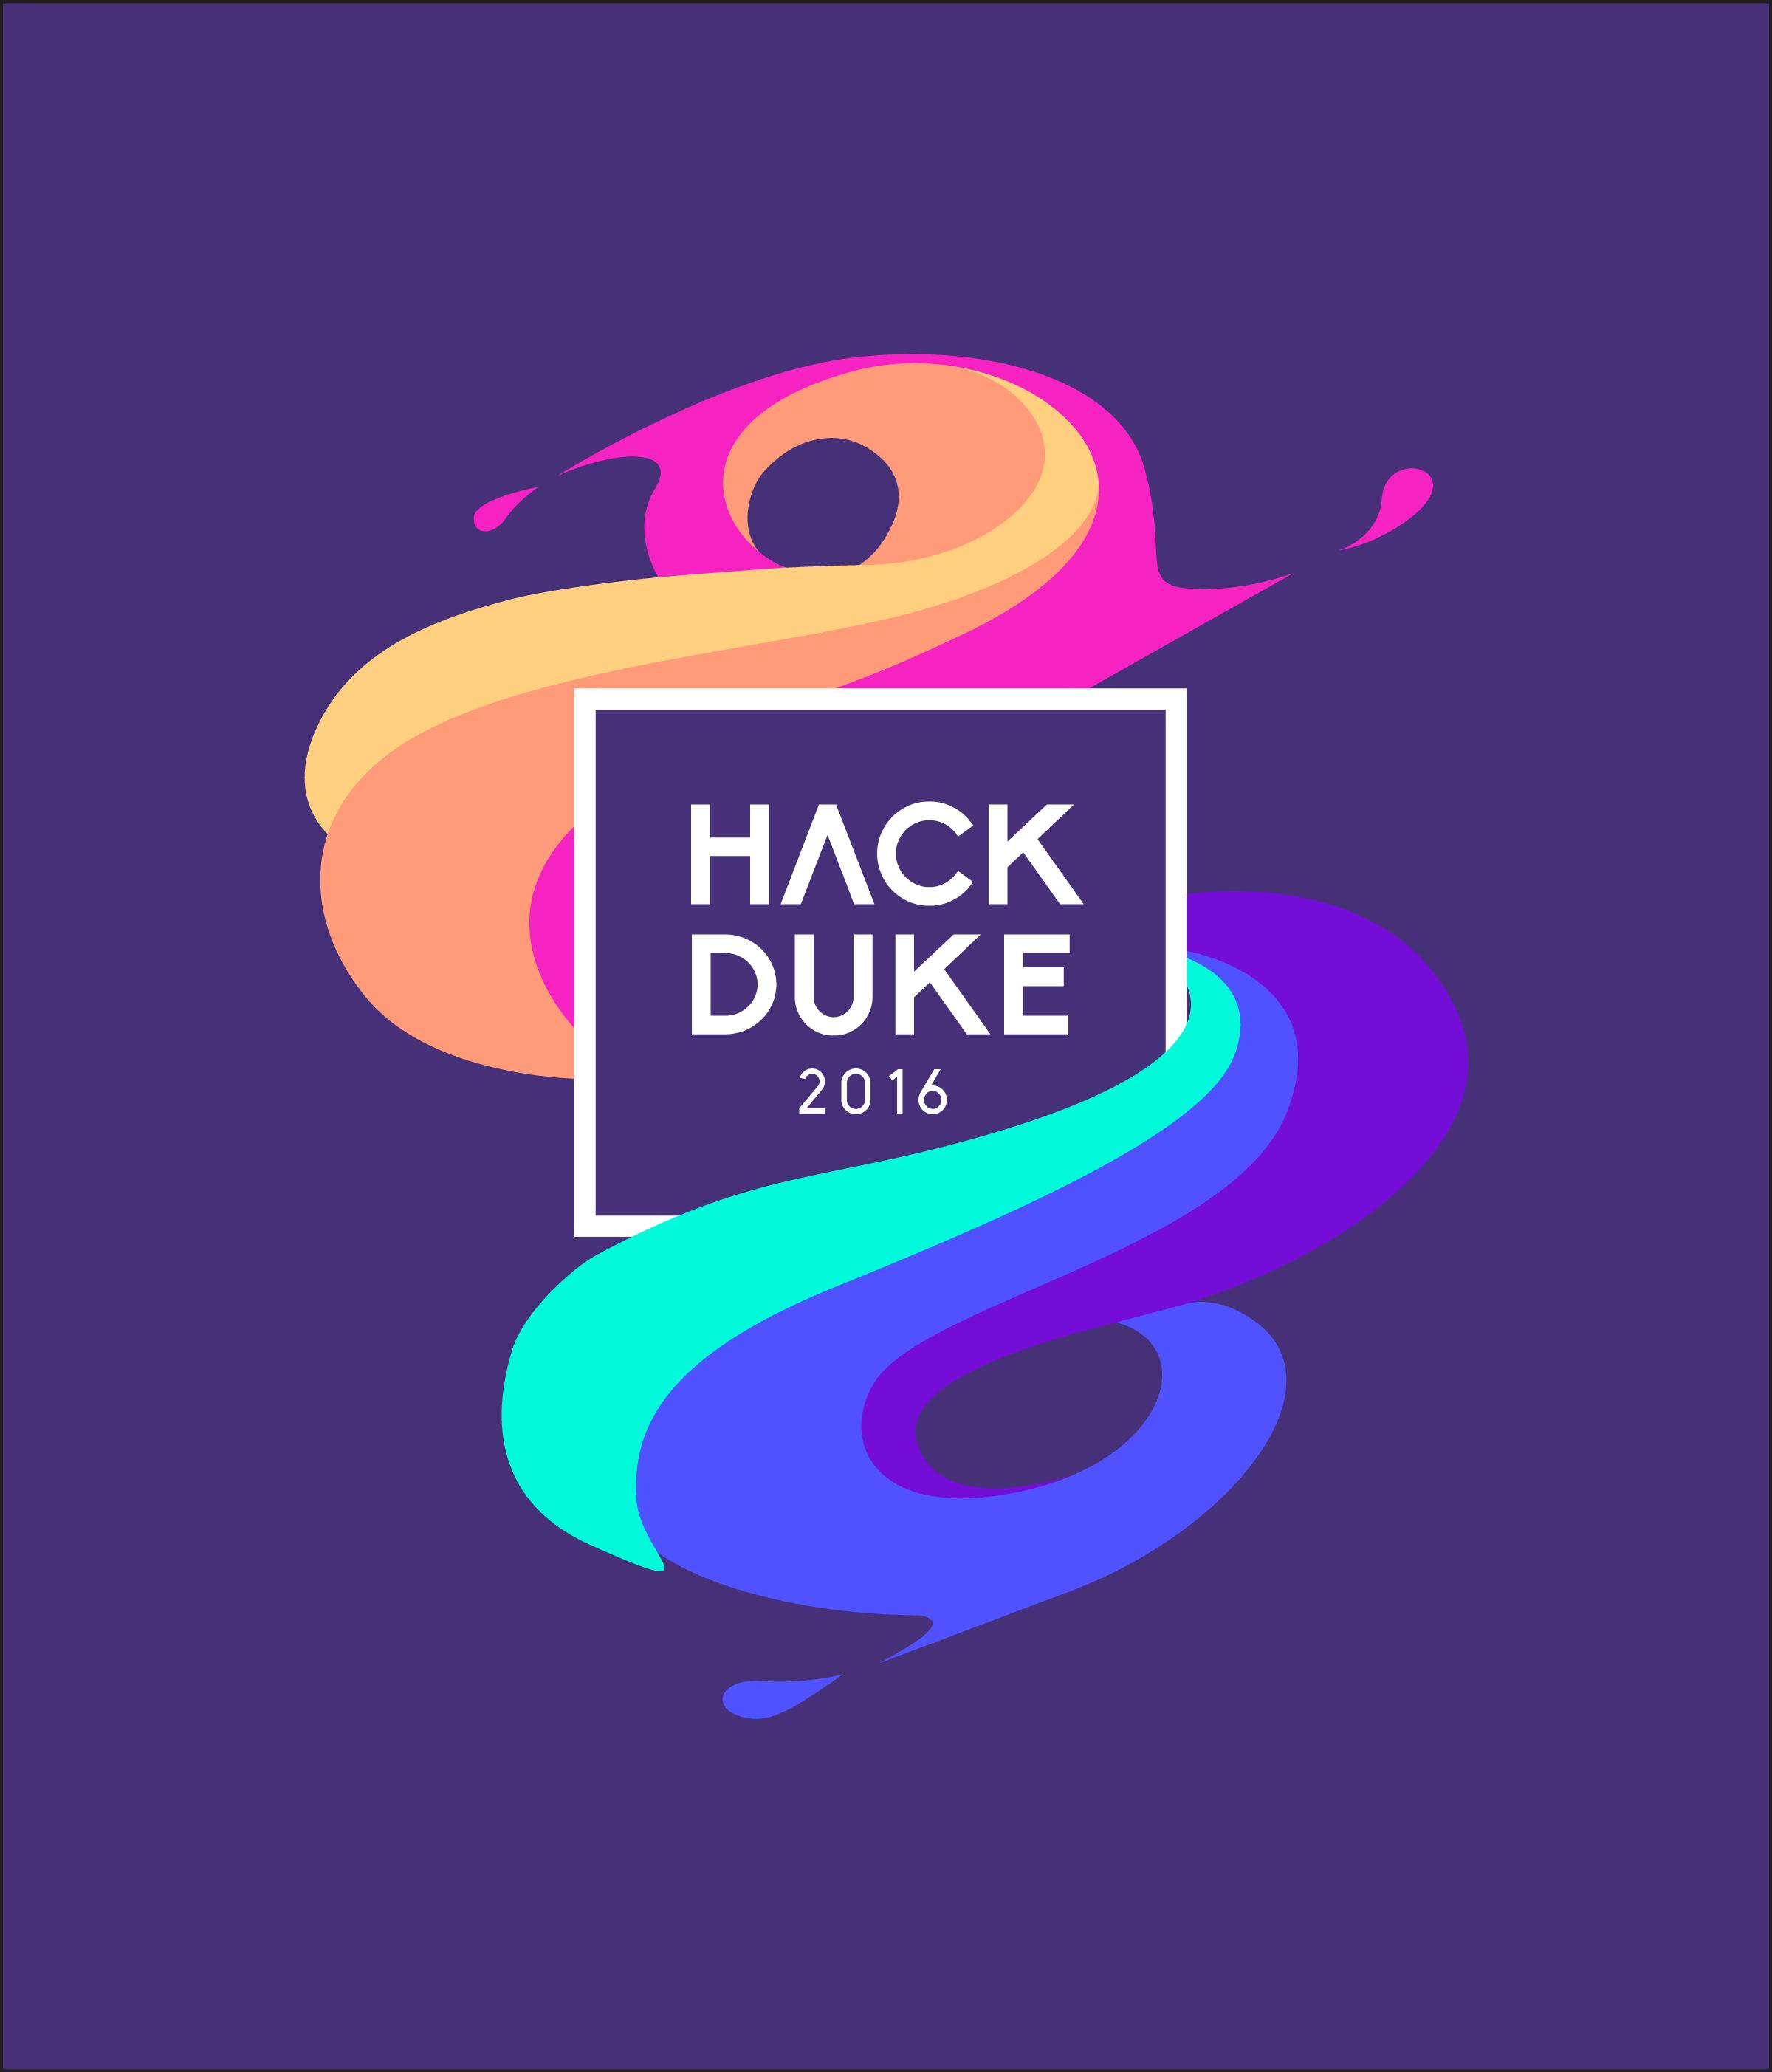 HackDuke tshirt design